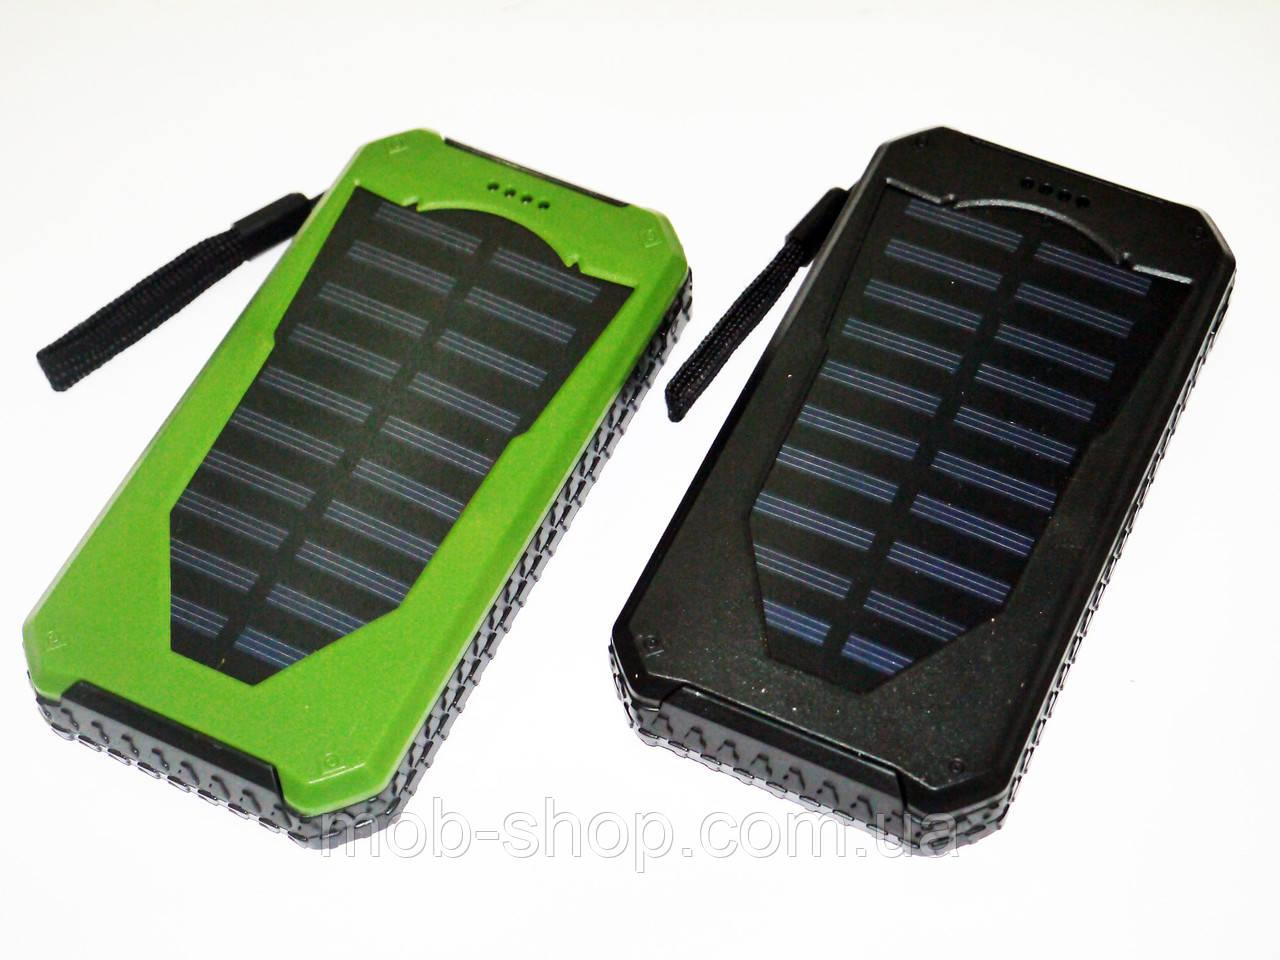 Повер банк Power Bank UKC 25800 mAh на солнечных батареях 2 USB